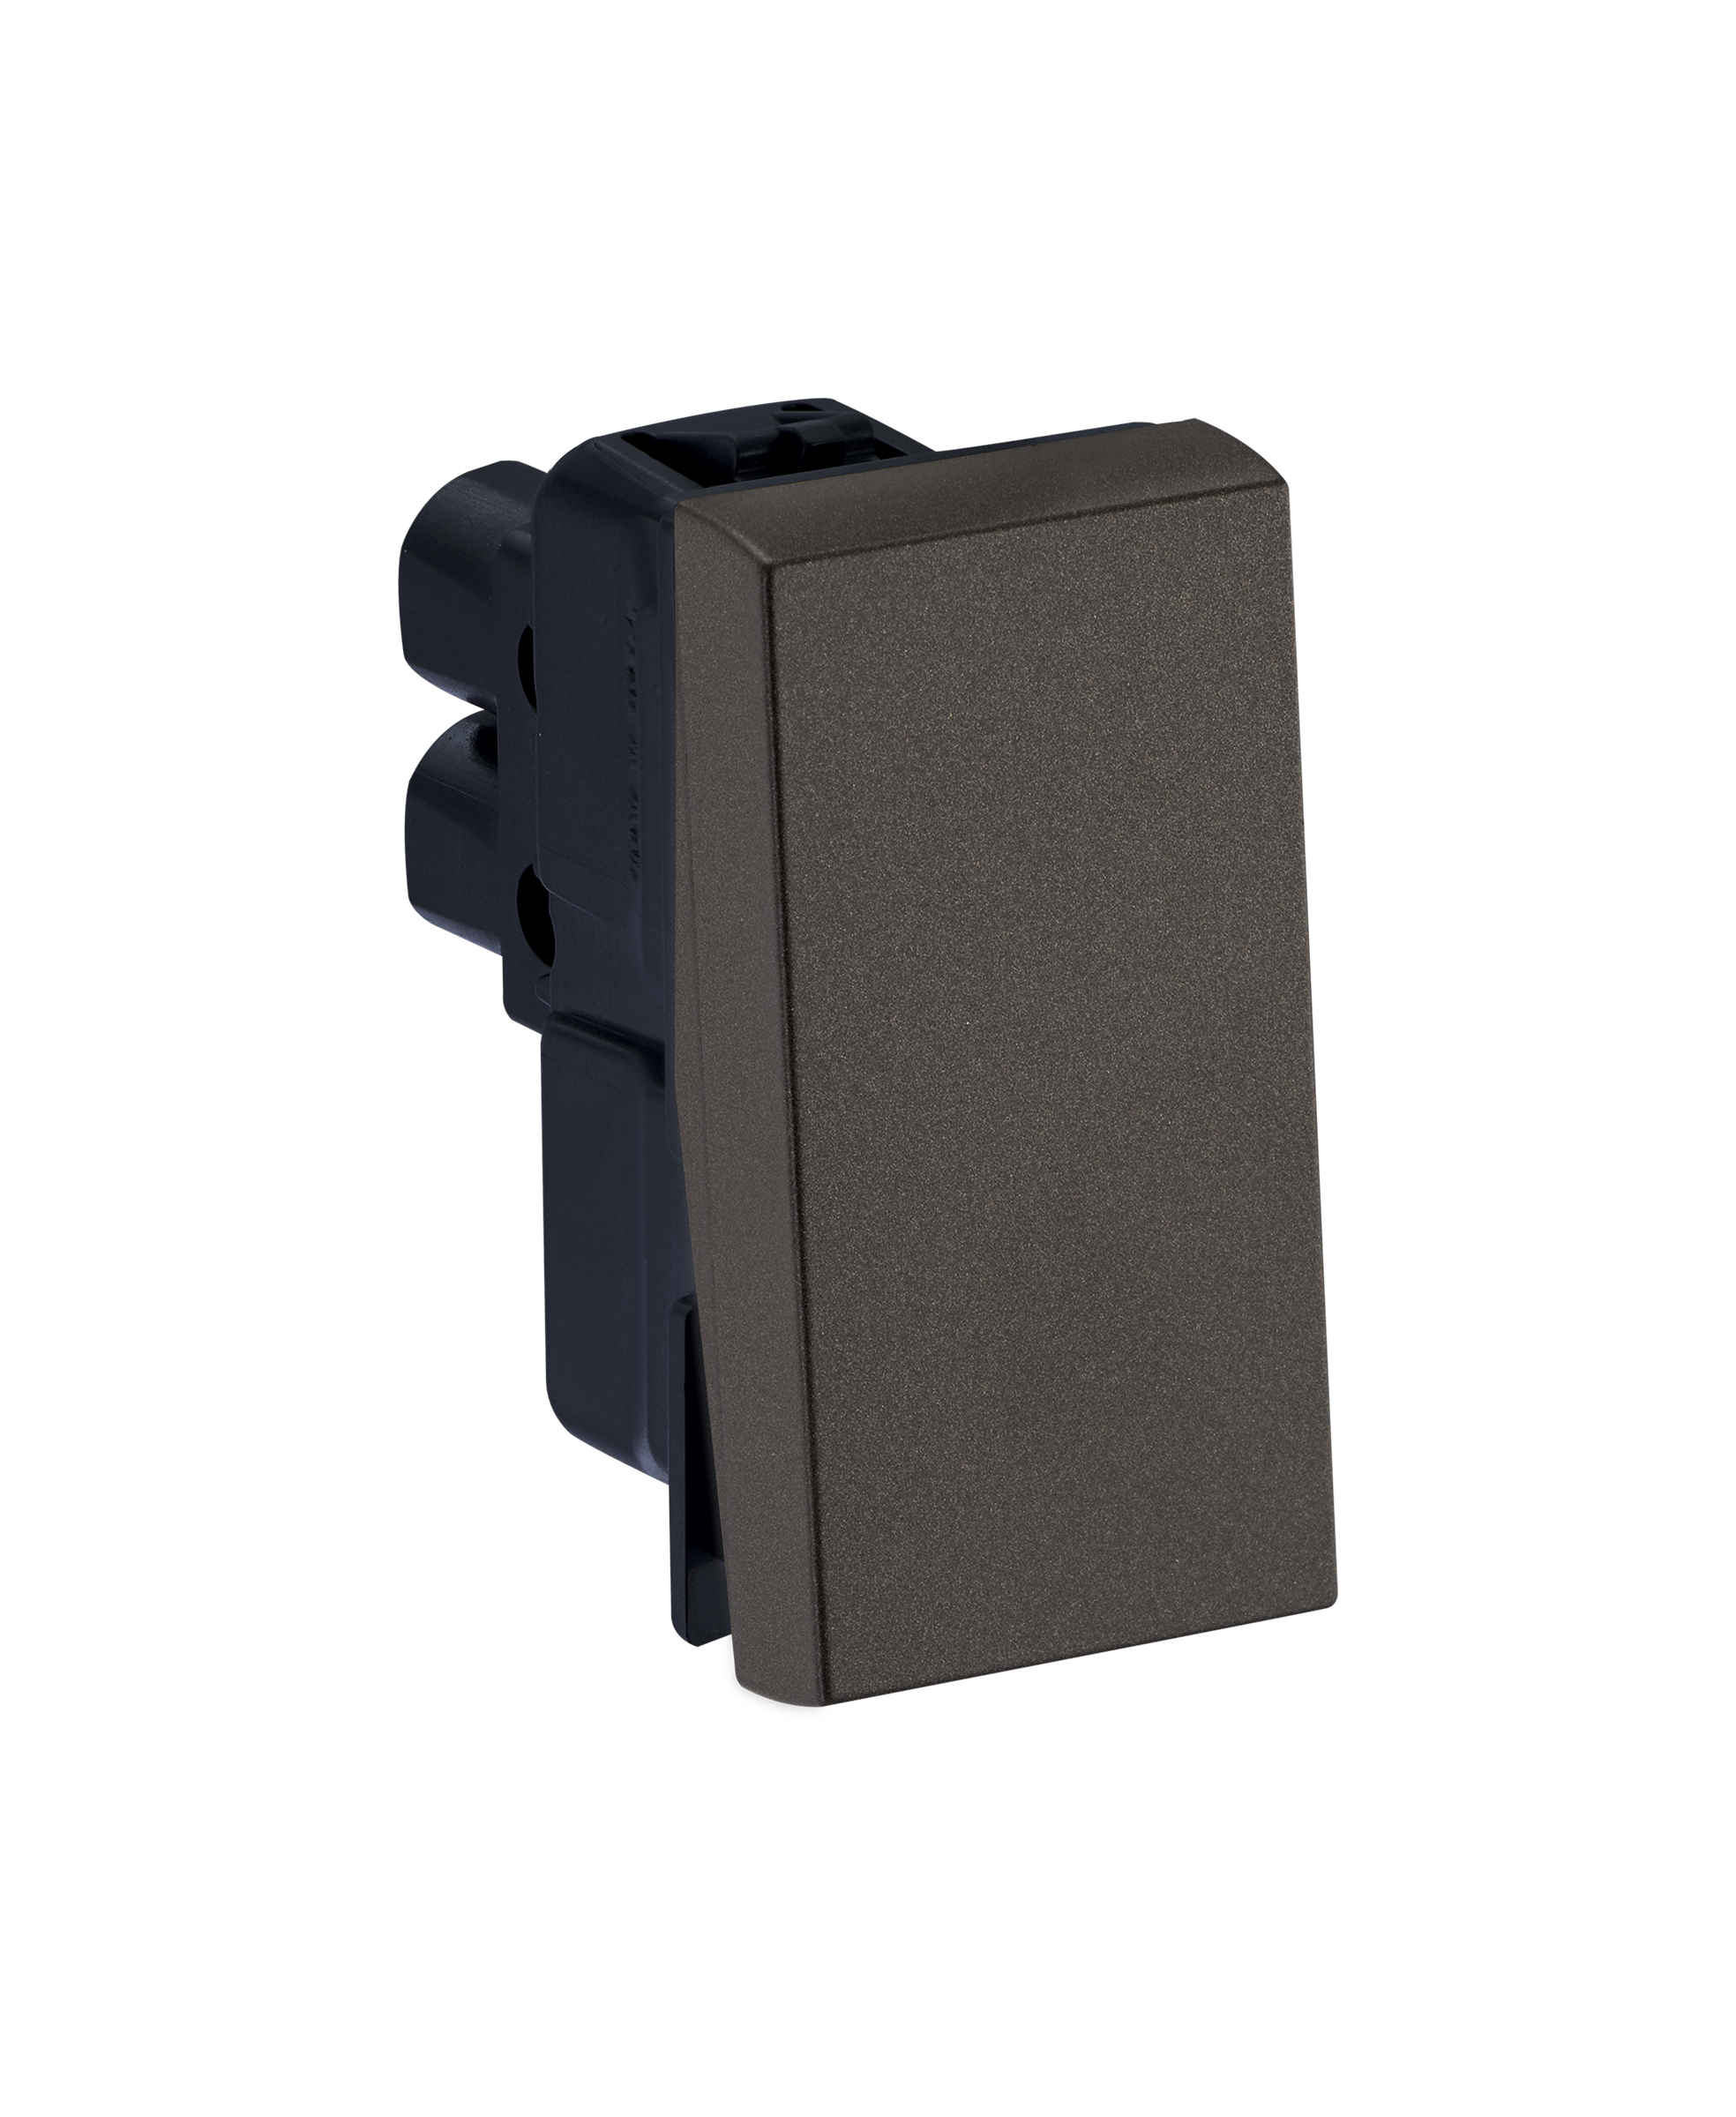 Myrius Nextgen 6A Push Button Sp 1 Way 1M Charcoal Grey